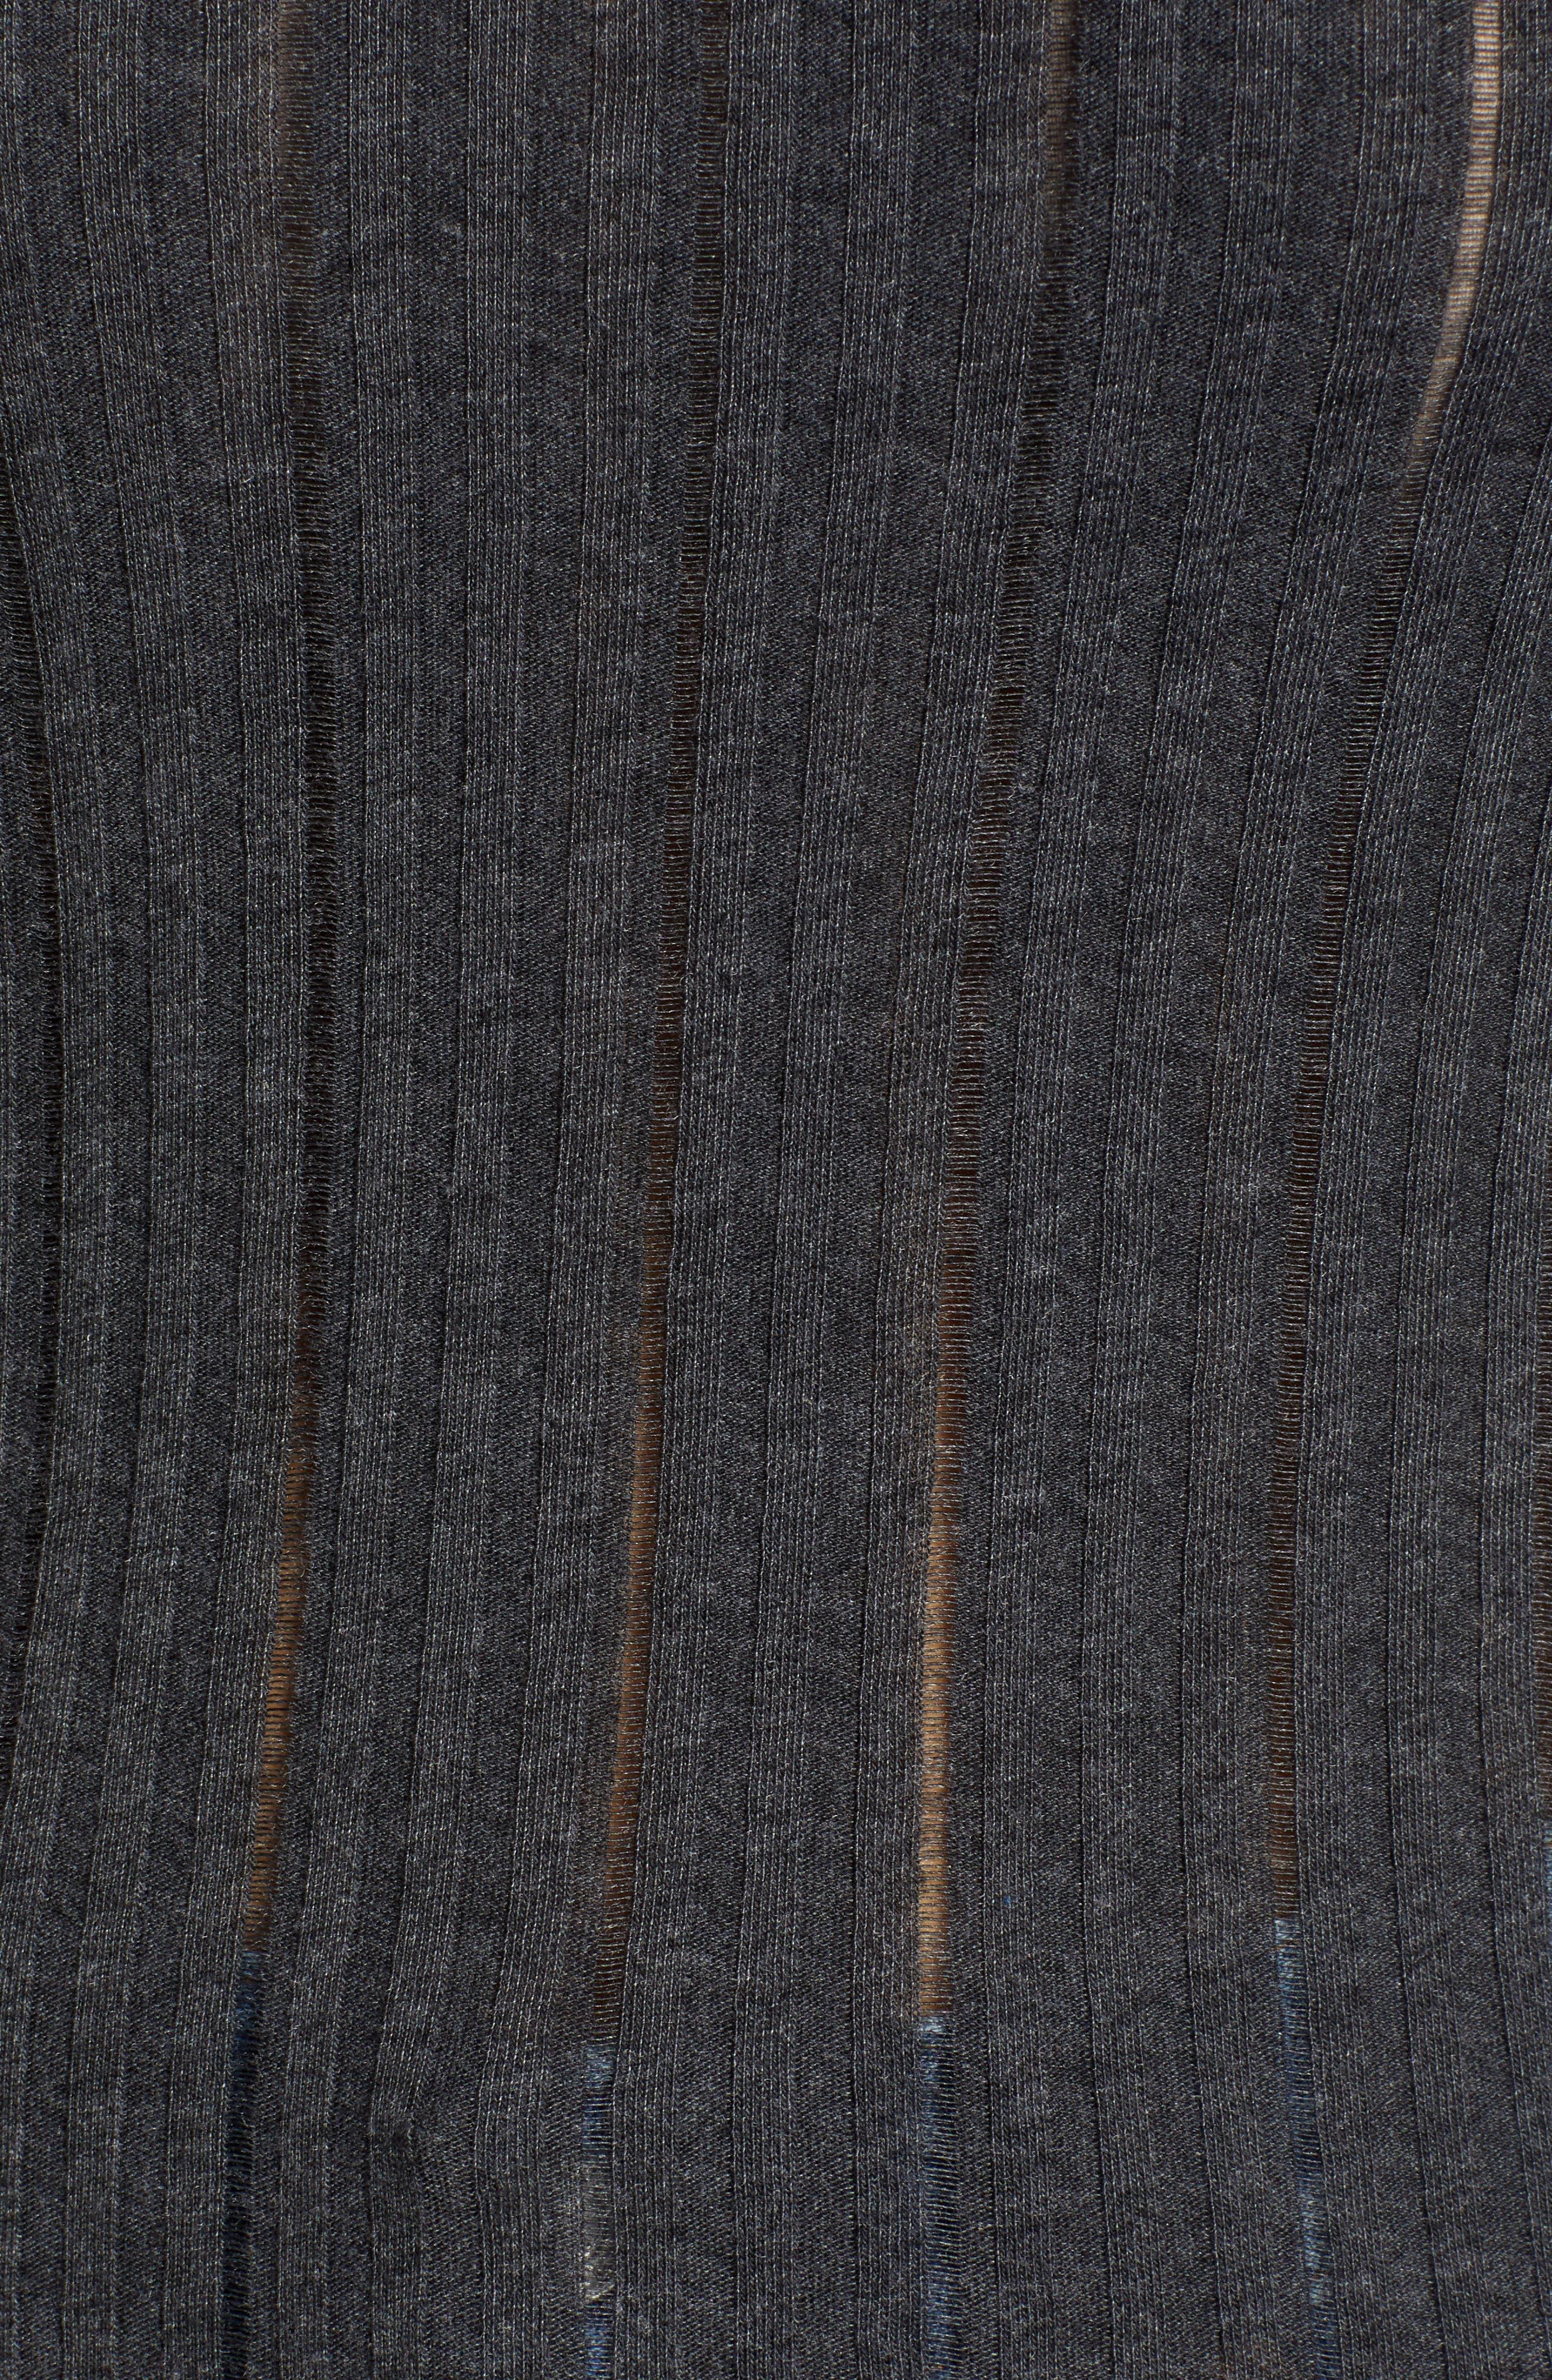 Tyne Ribbed Tee,                             Alternate thumbnail 5, color,                             001